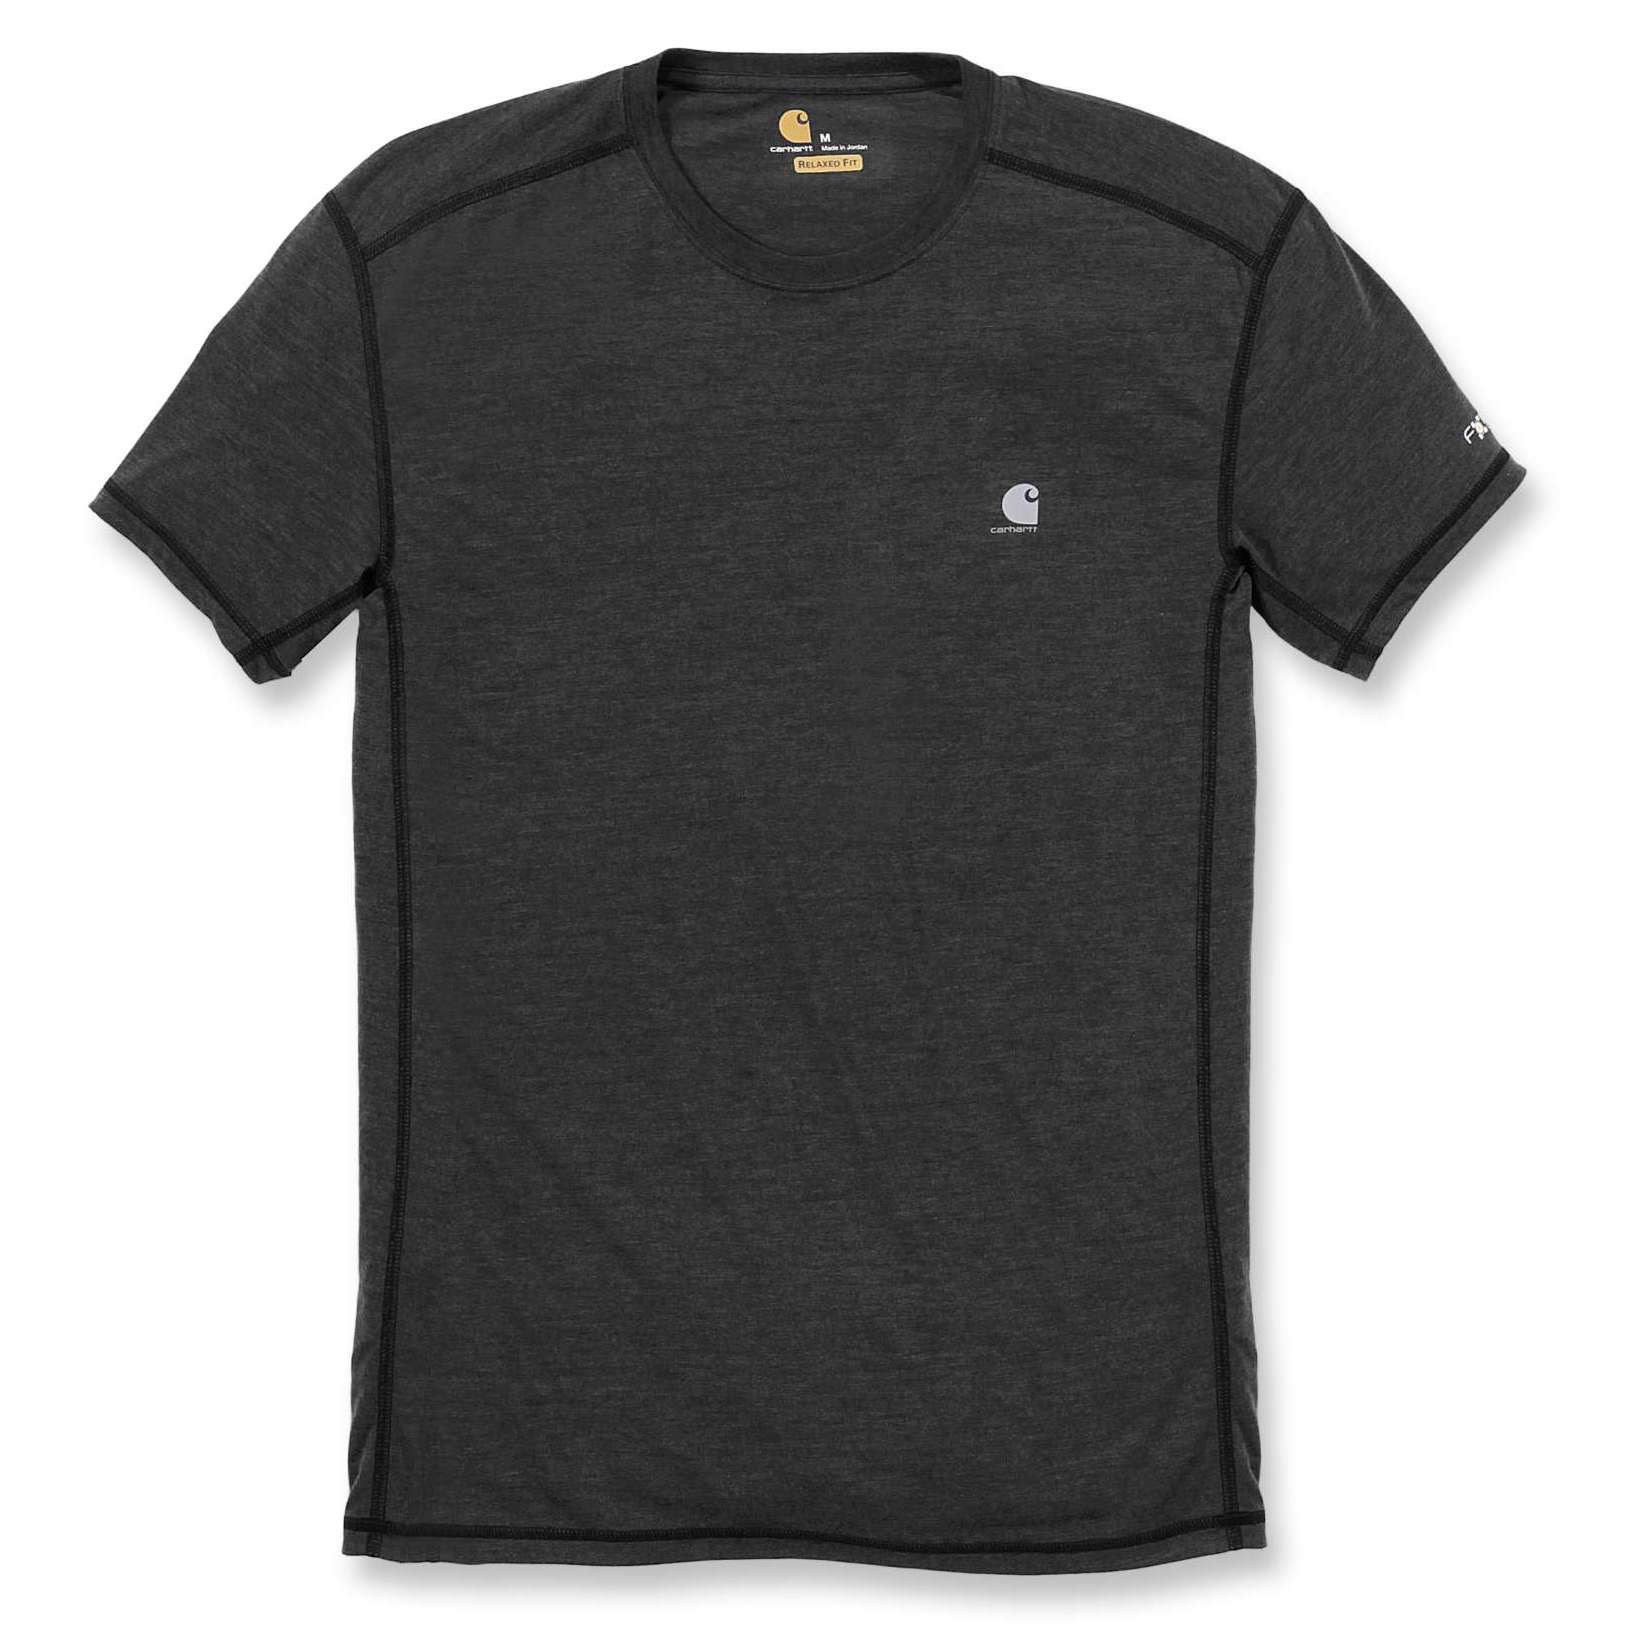 Футболка Carhartt Force Extremes T-Shirt S/S - 102960 (Black/Black Heather; L)